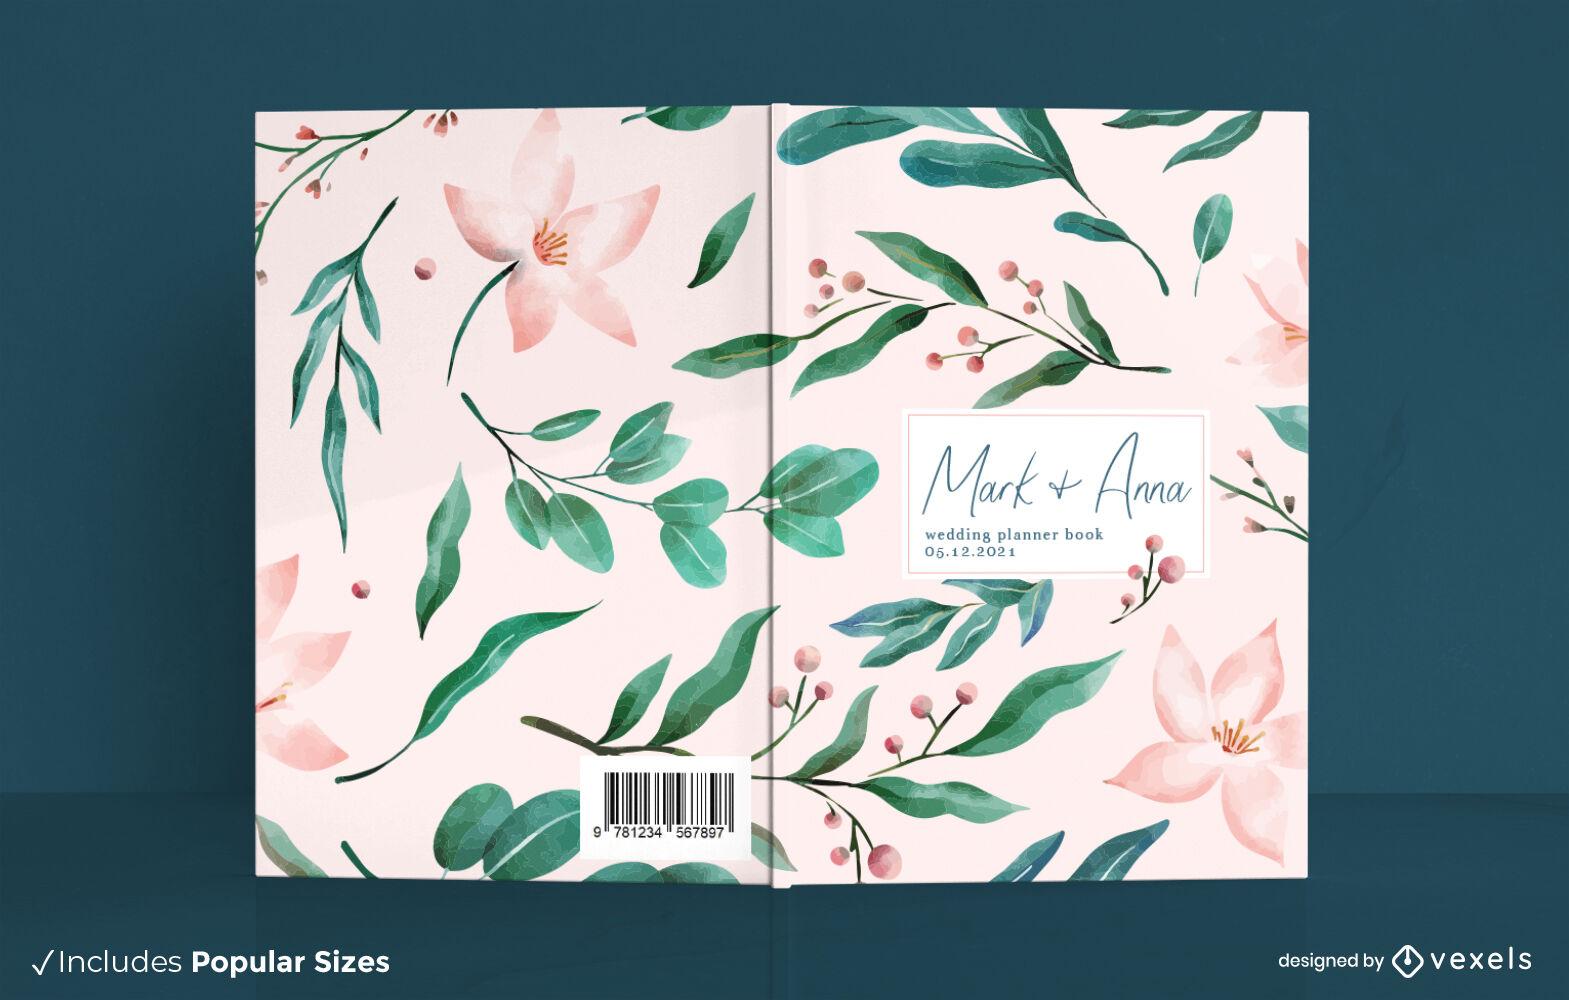 Beautiful planner book cover design